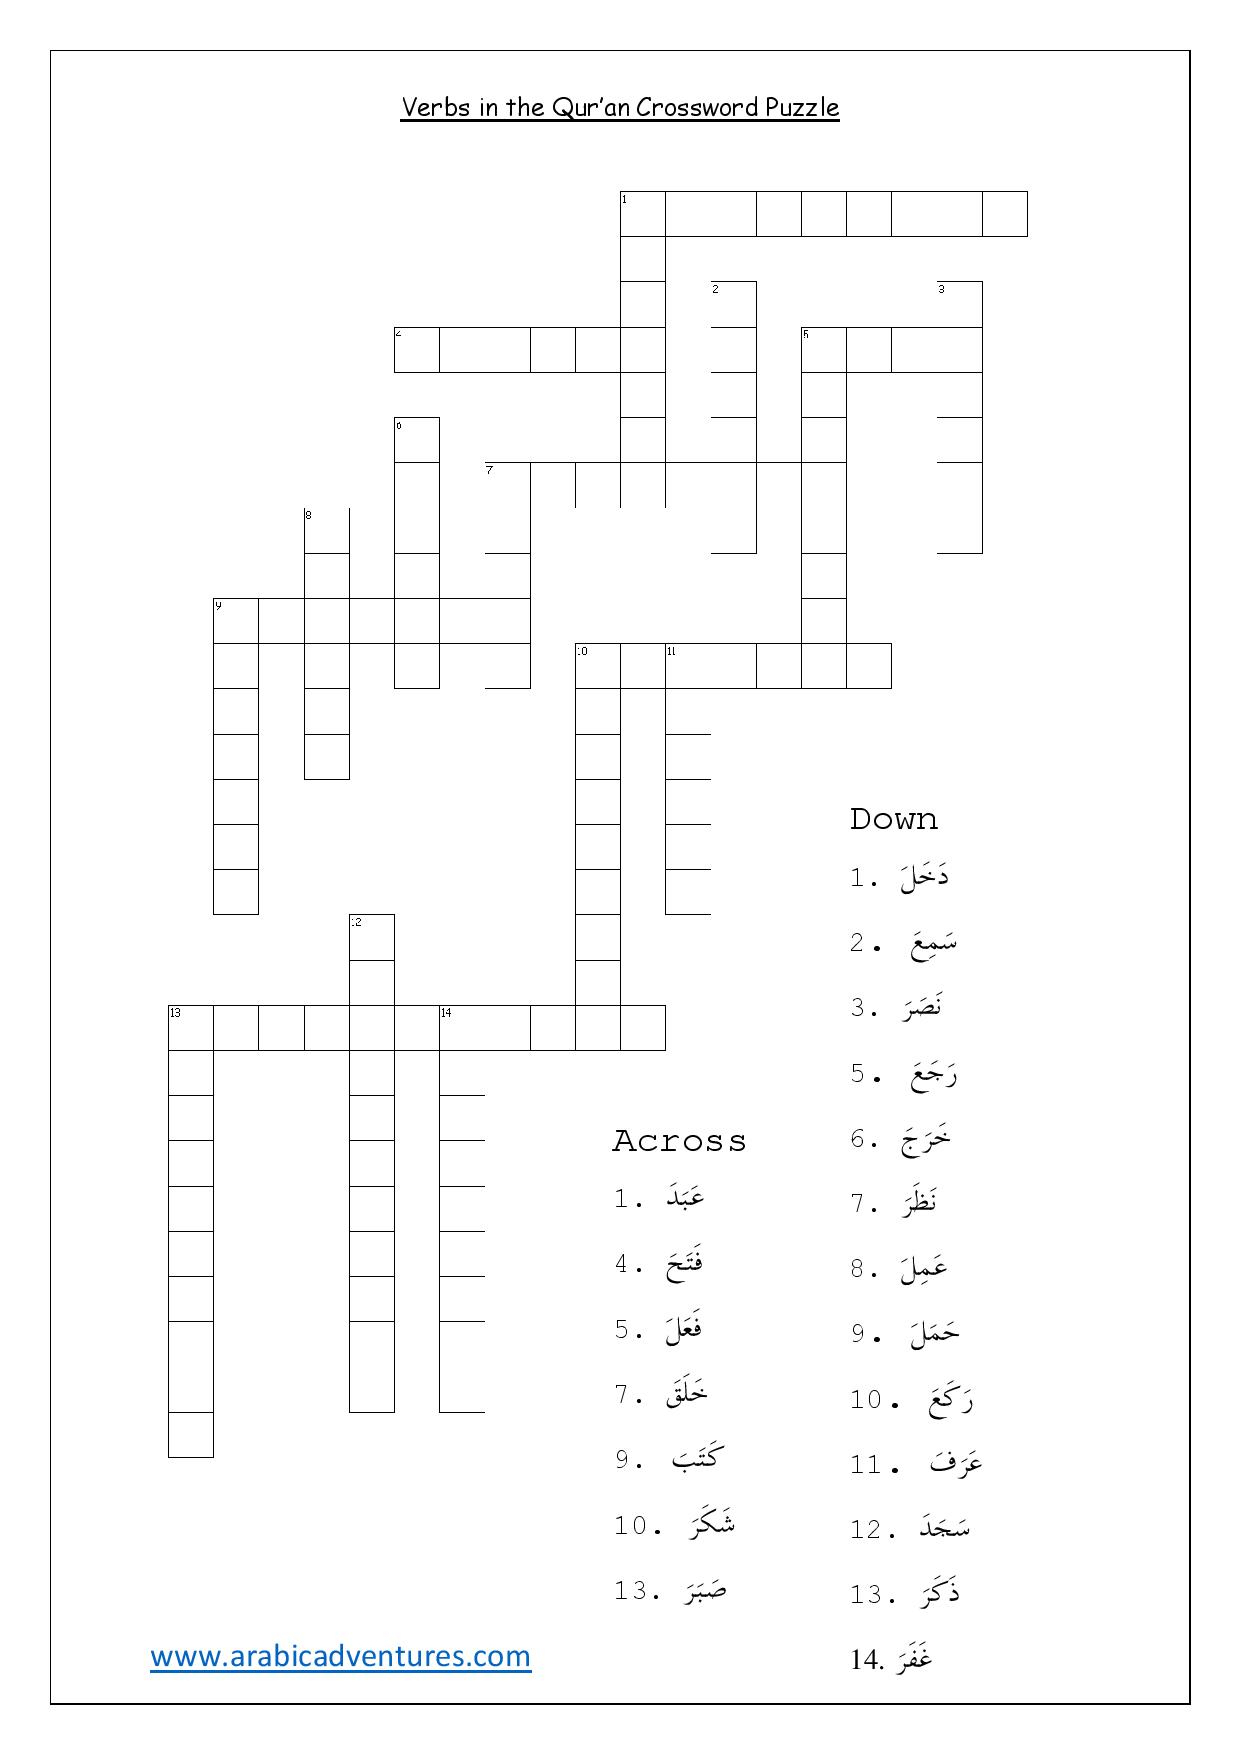 Islamic Printables | Arabic Adventures - Islamic Crossword Puzzles Printable